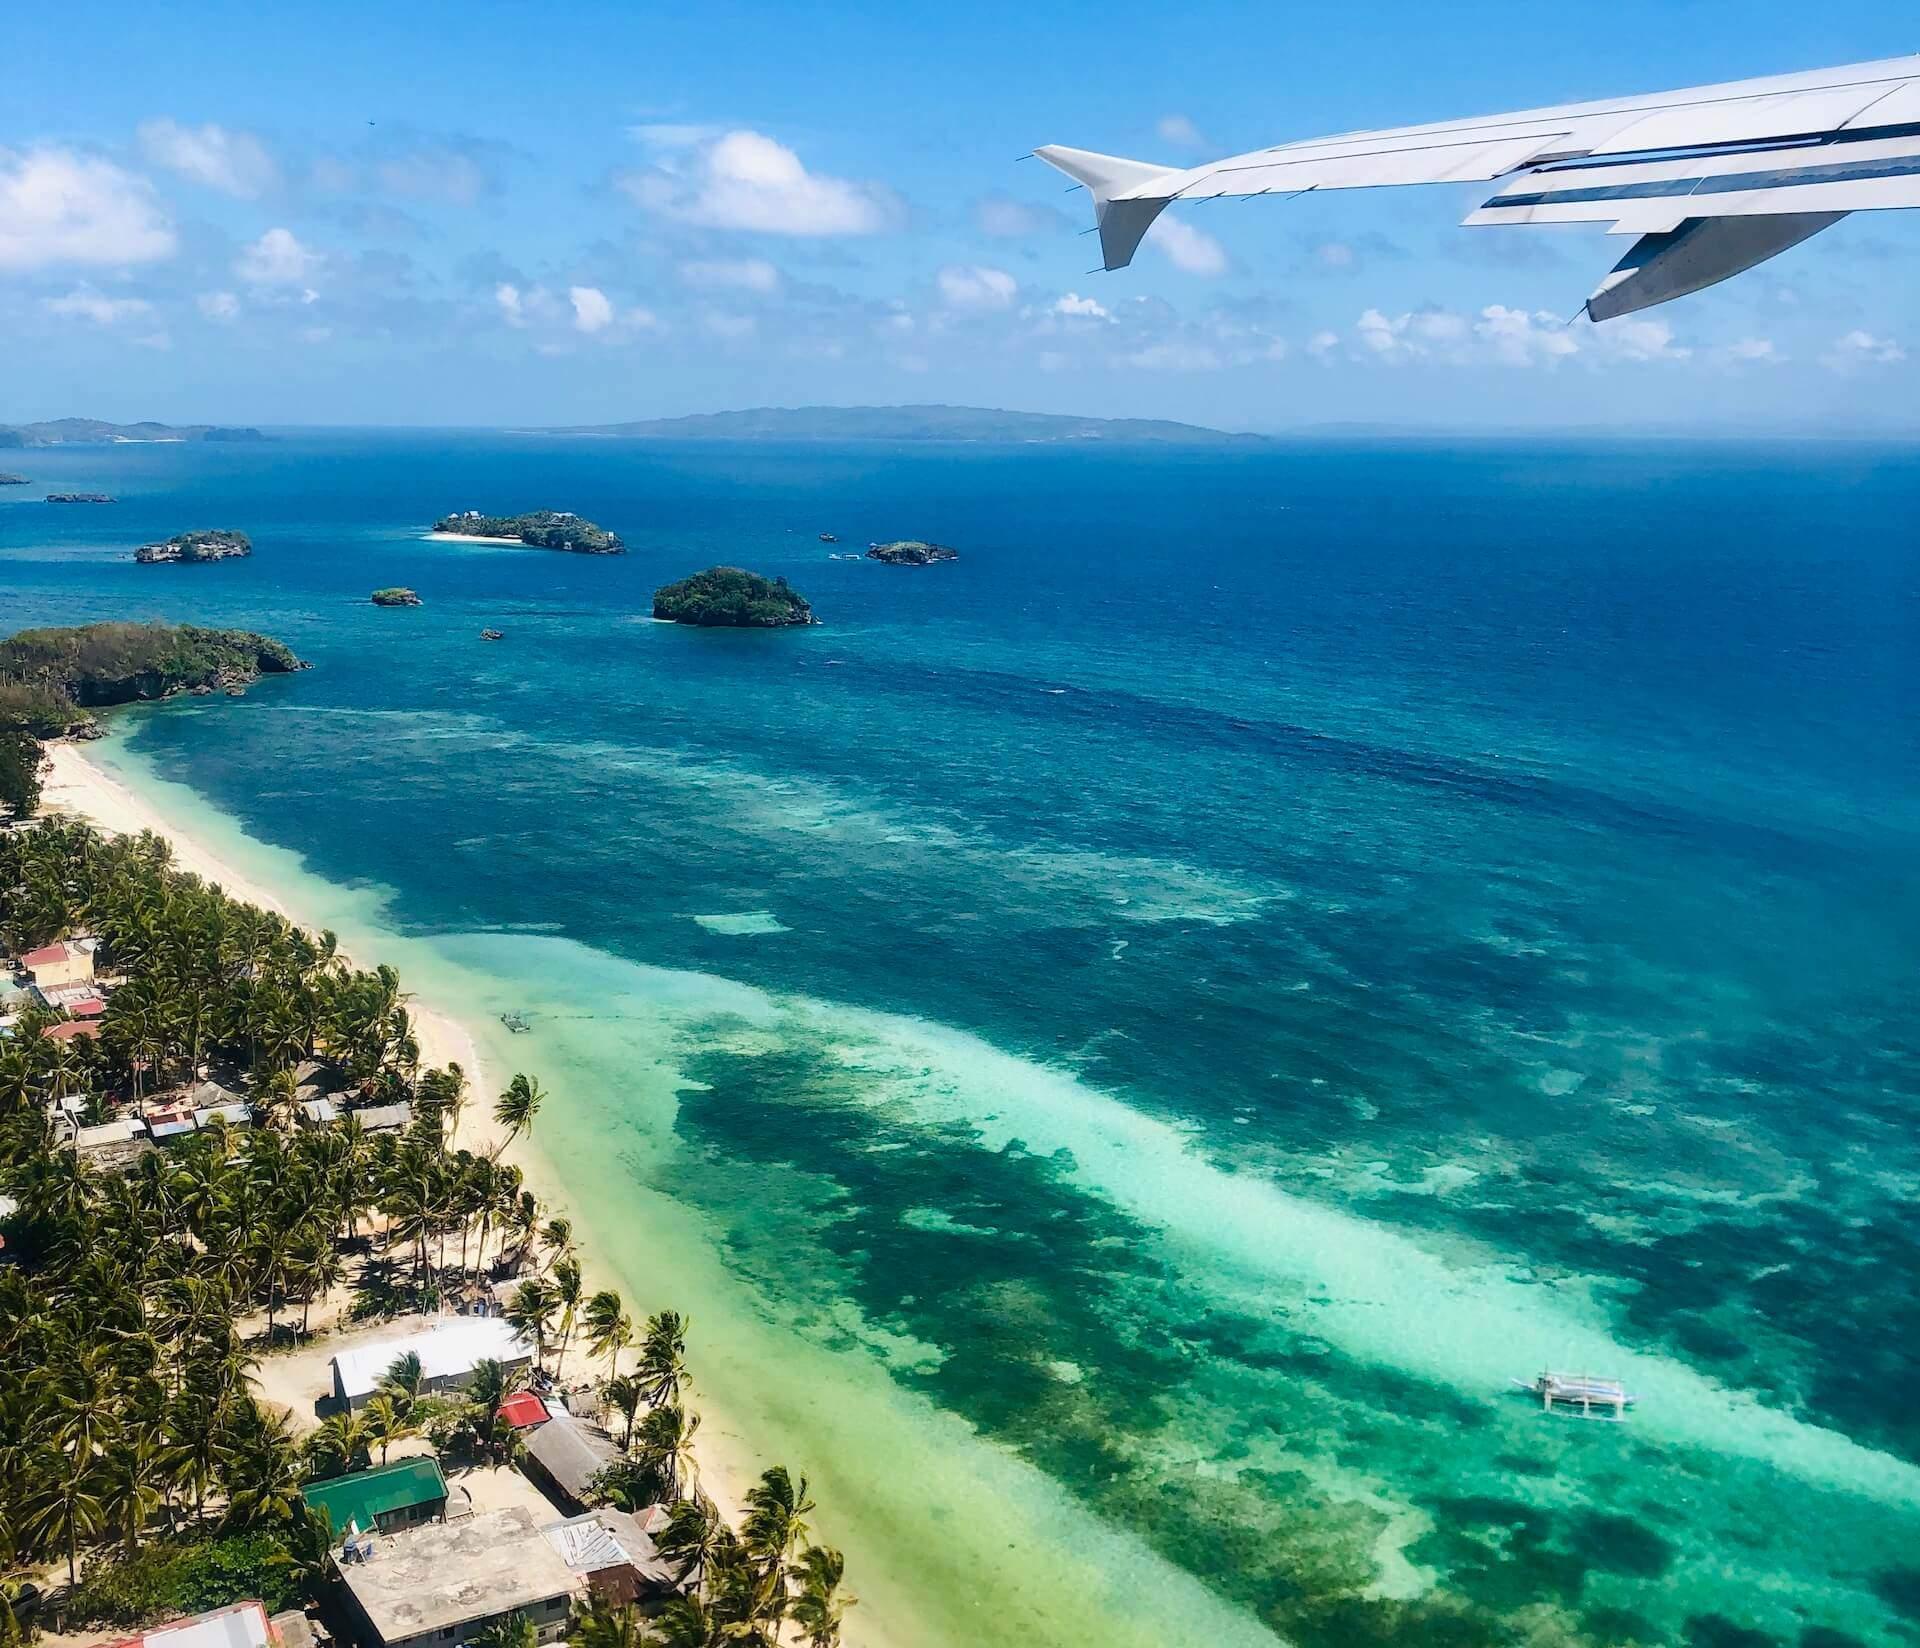 Abflug vom Caticlan Airport Boracay